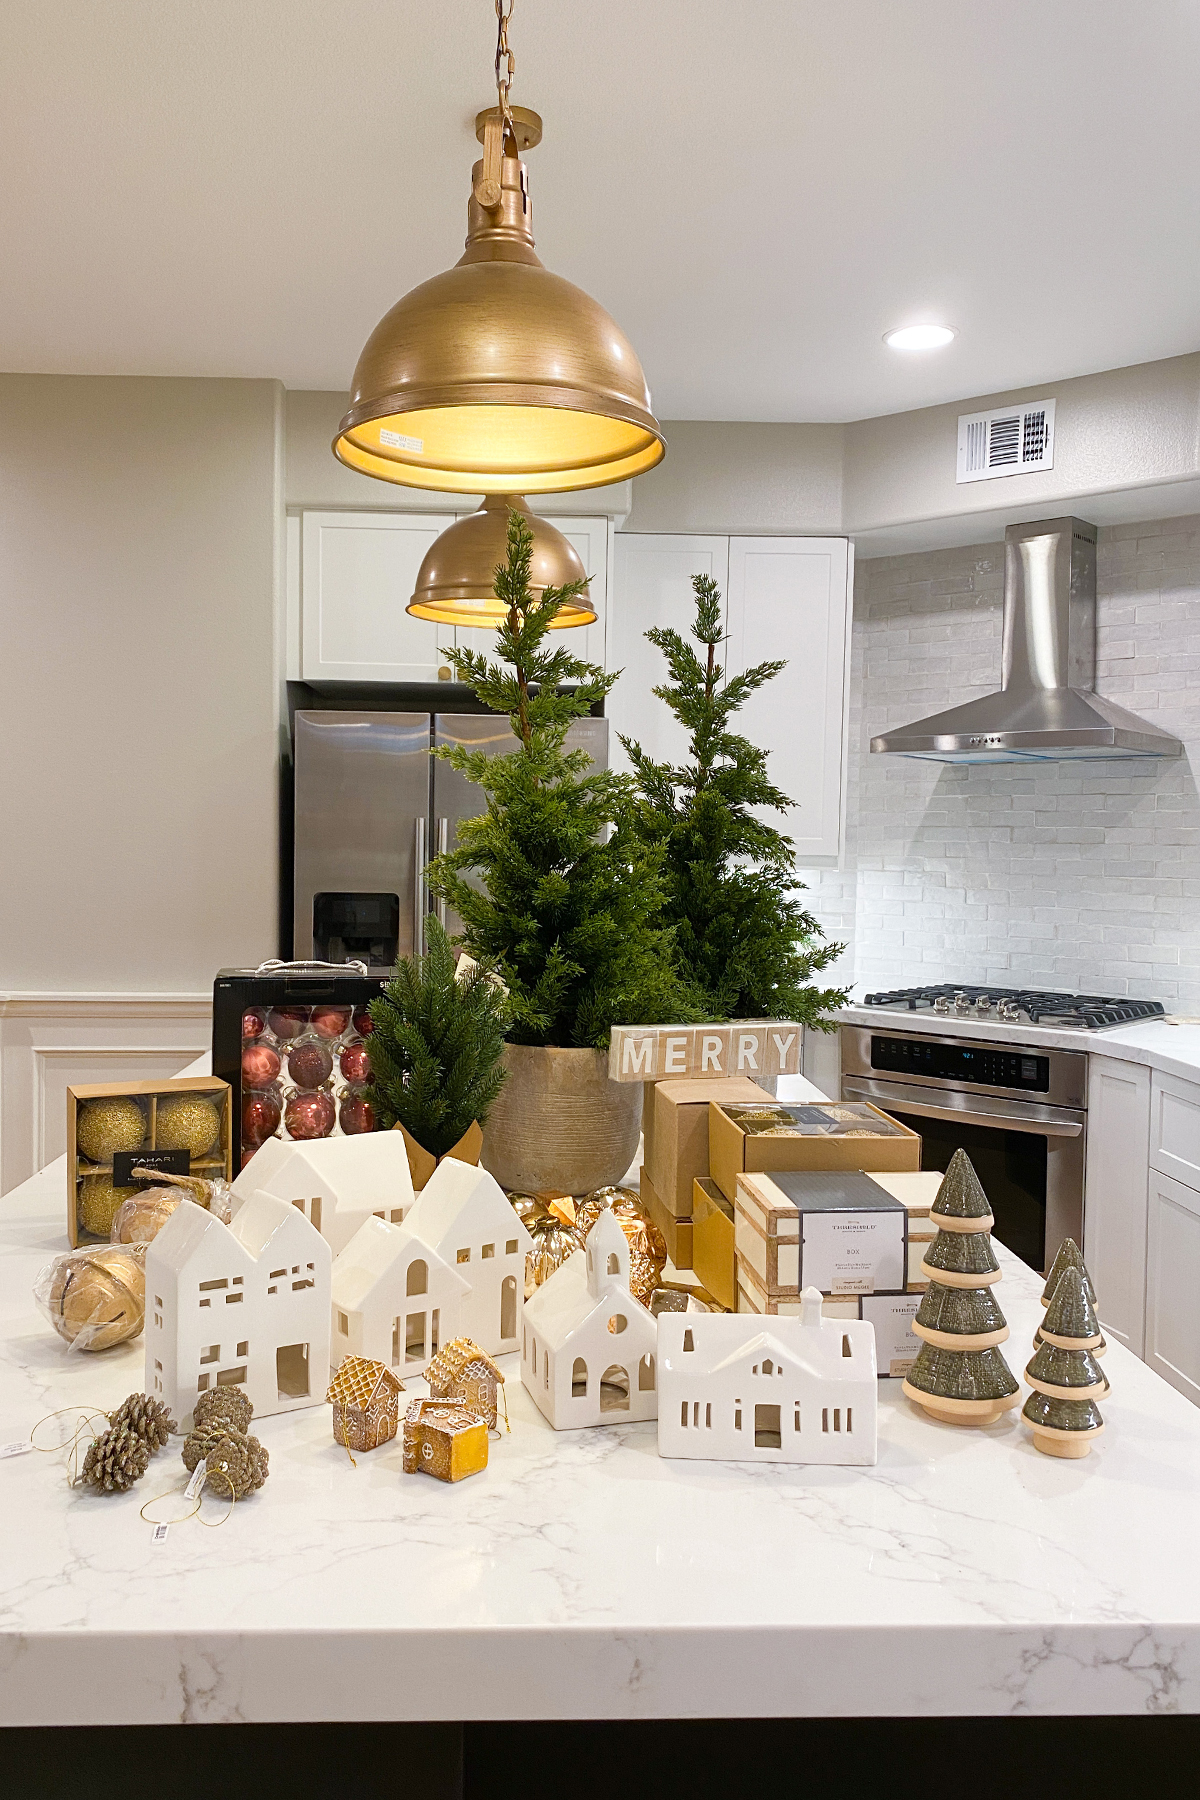 Christmas decor storage